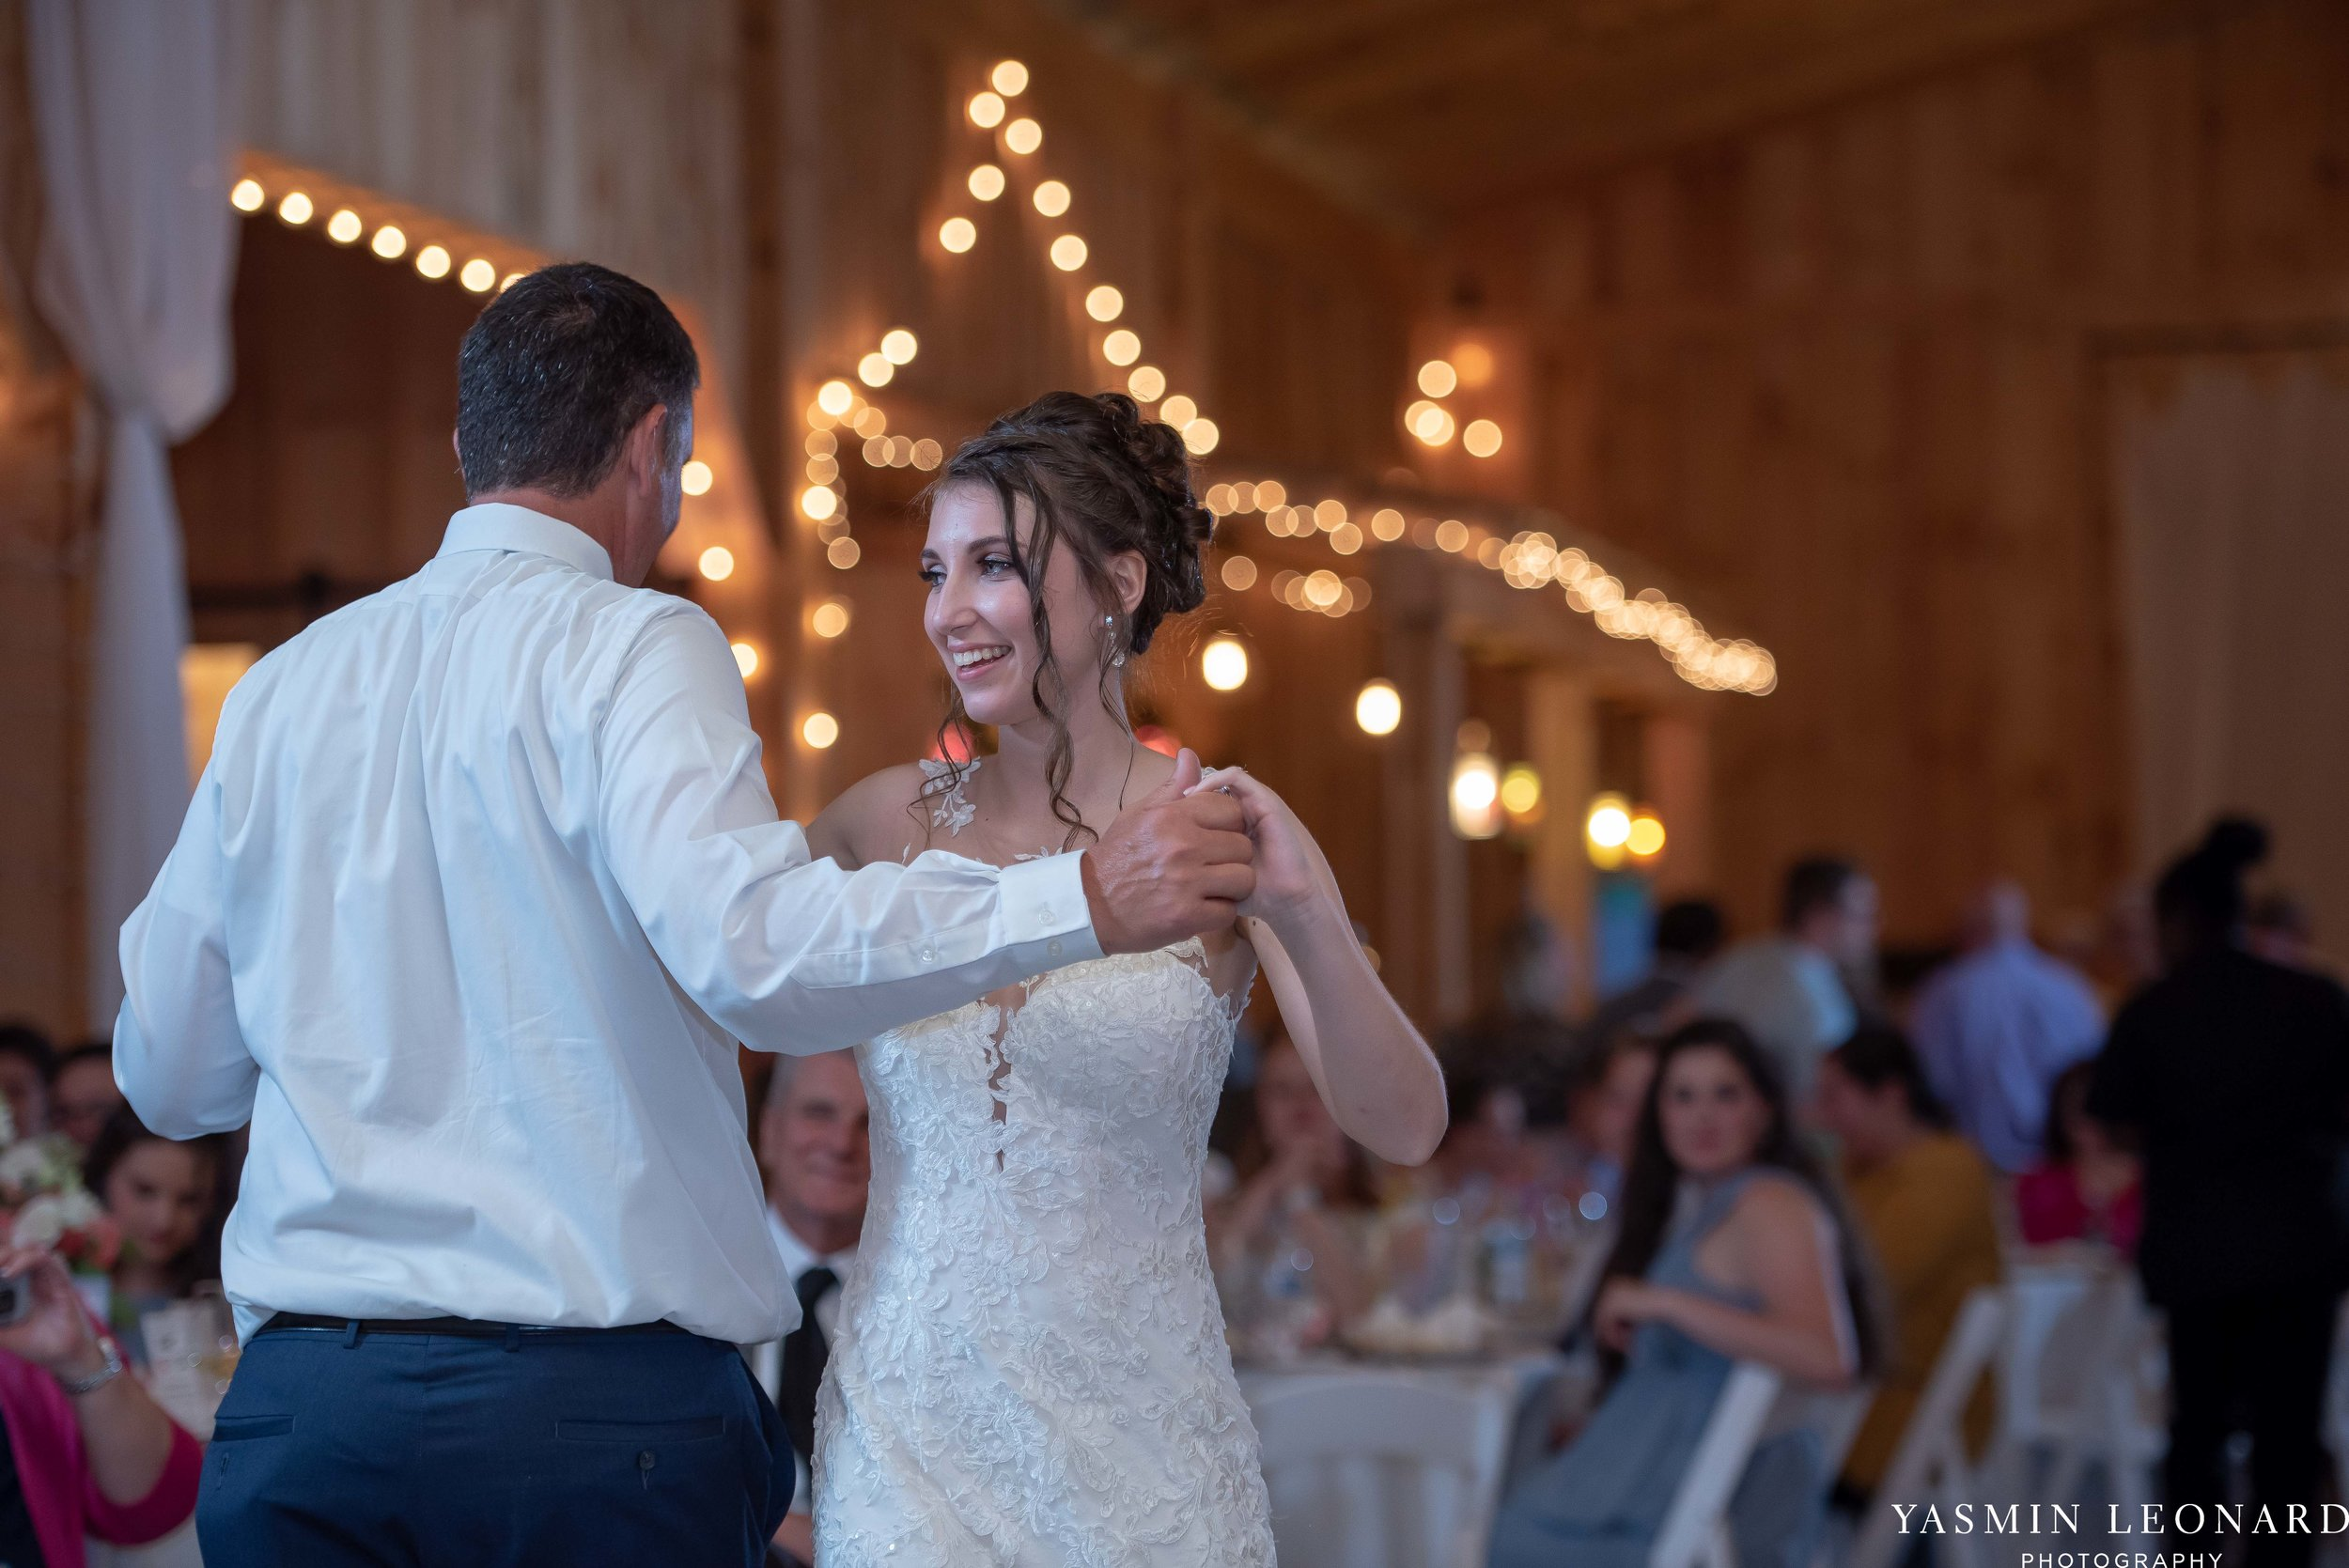 Old Homeplace Vineyard - NC Weddings - Outdoor Summer Weddings - Peony Boutique - Vineyard Wedding - NC Photographer - Yasmin Leonard Photography-68.jpg